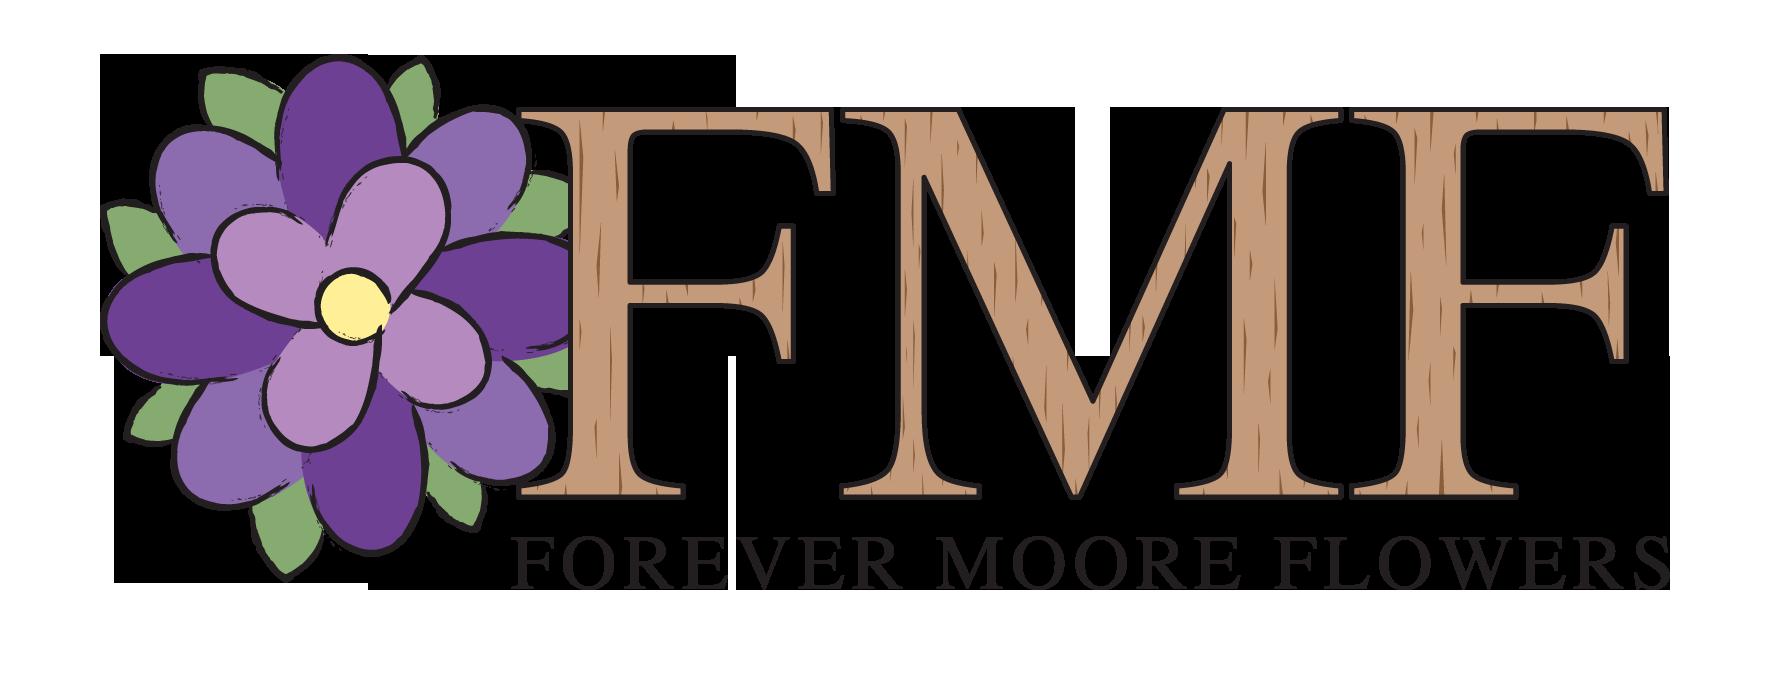 Forever Moore Flowers